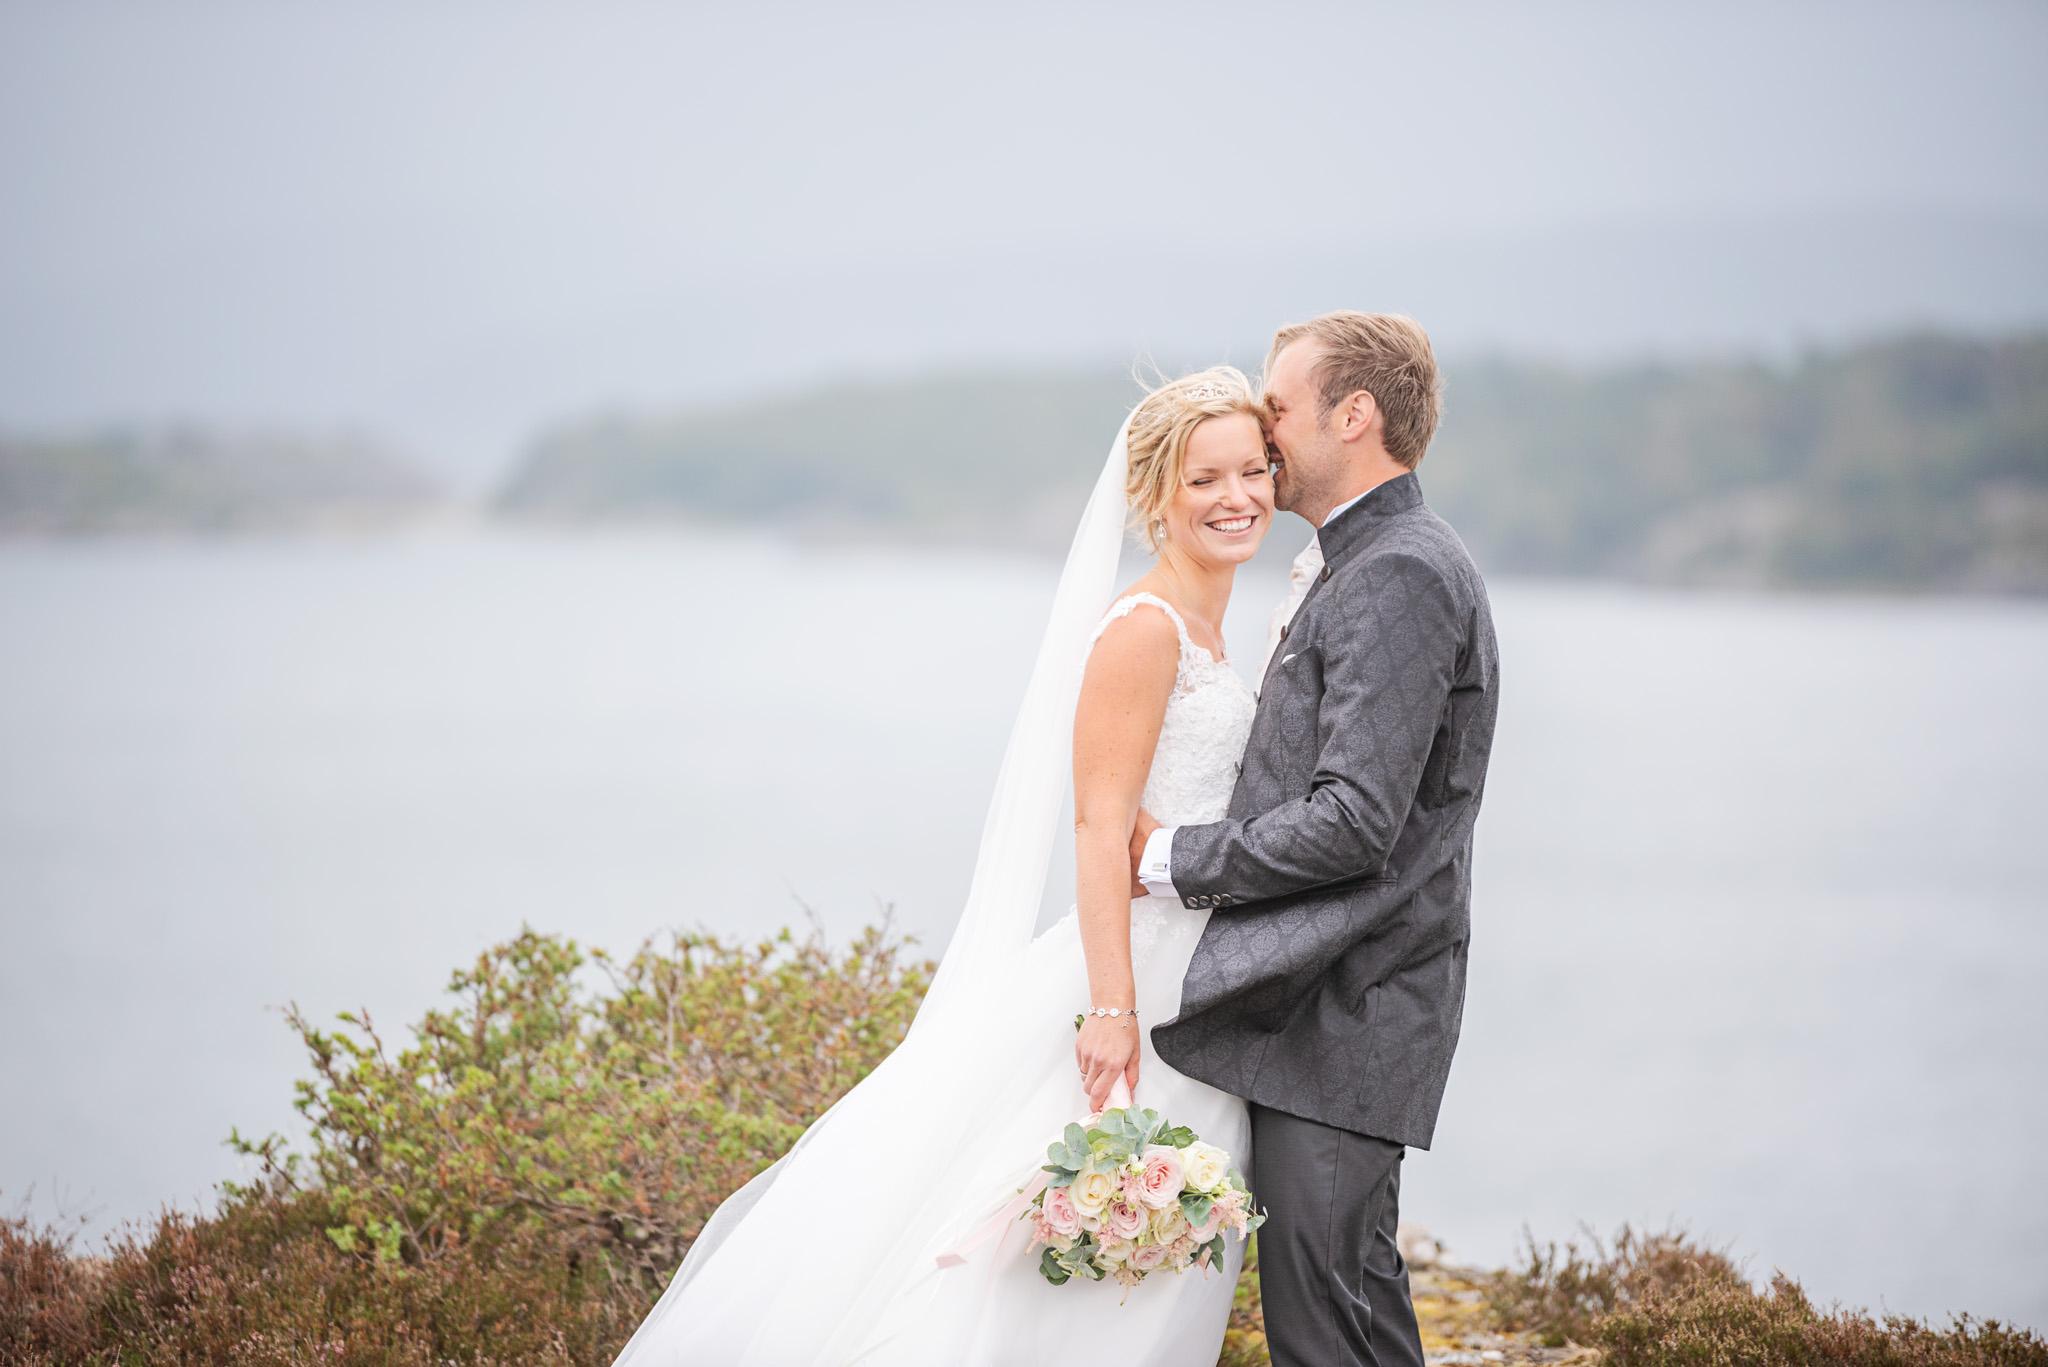 Caroline & Christoffer – Bröllop på Tjörn